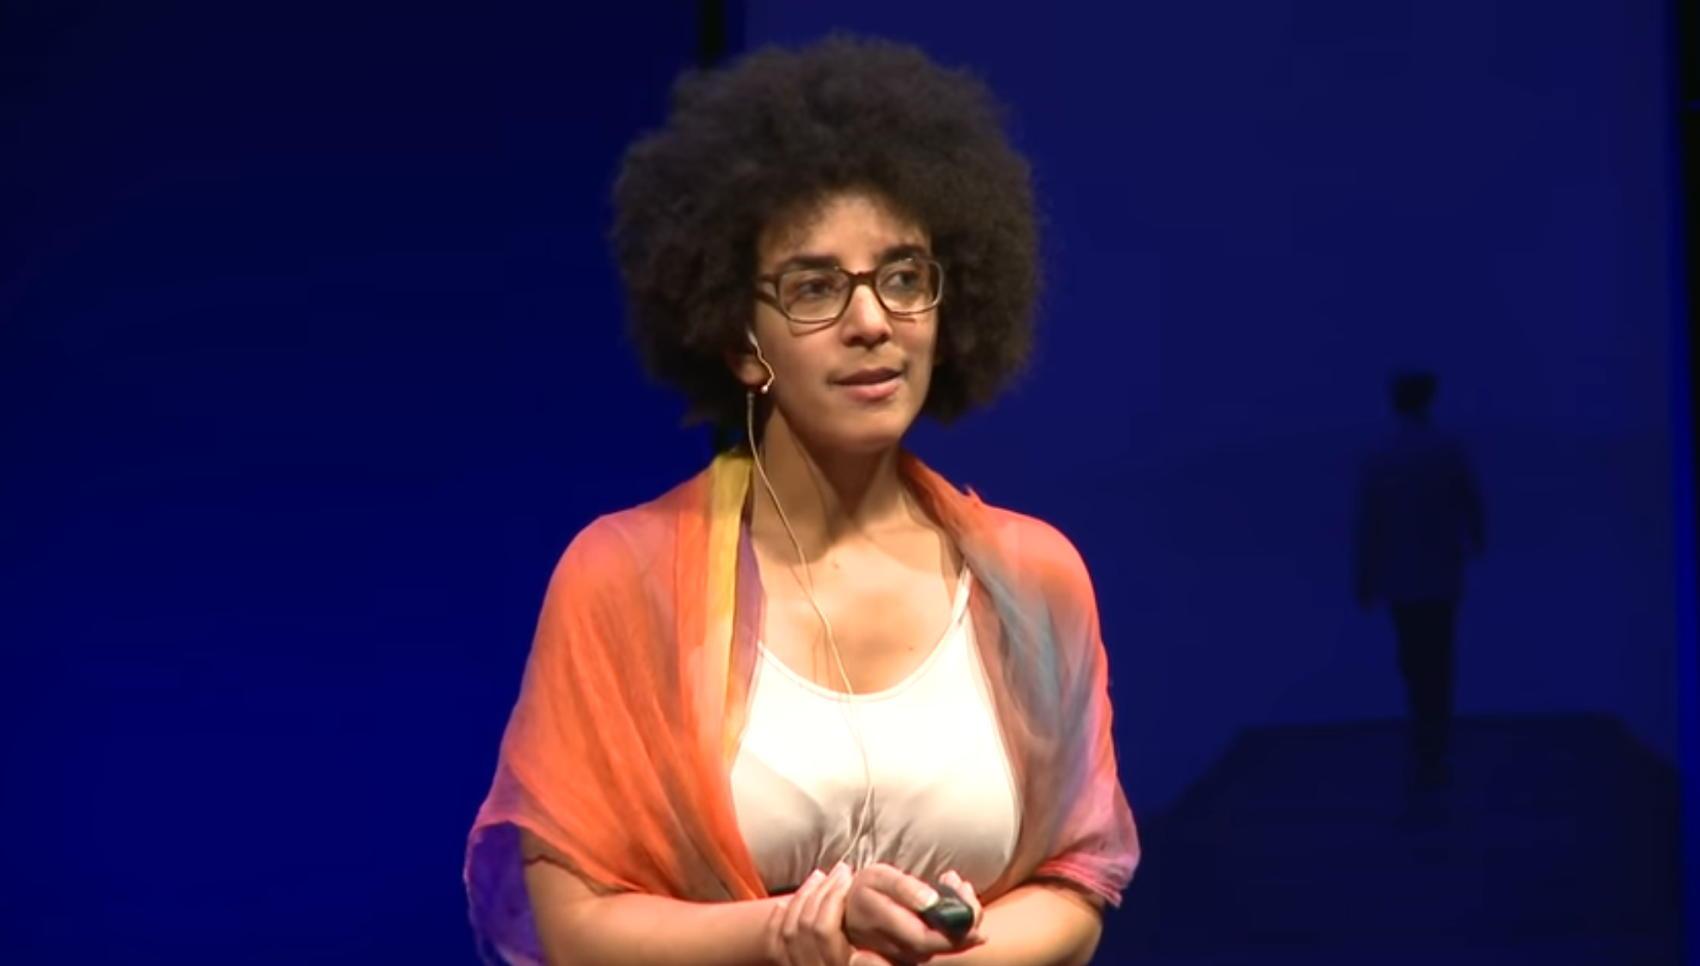 Timnit Gebru - Image Credit TEDx Talks